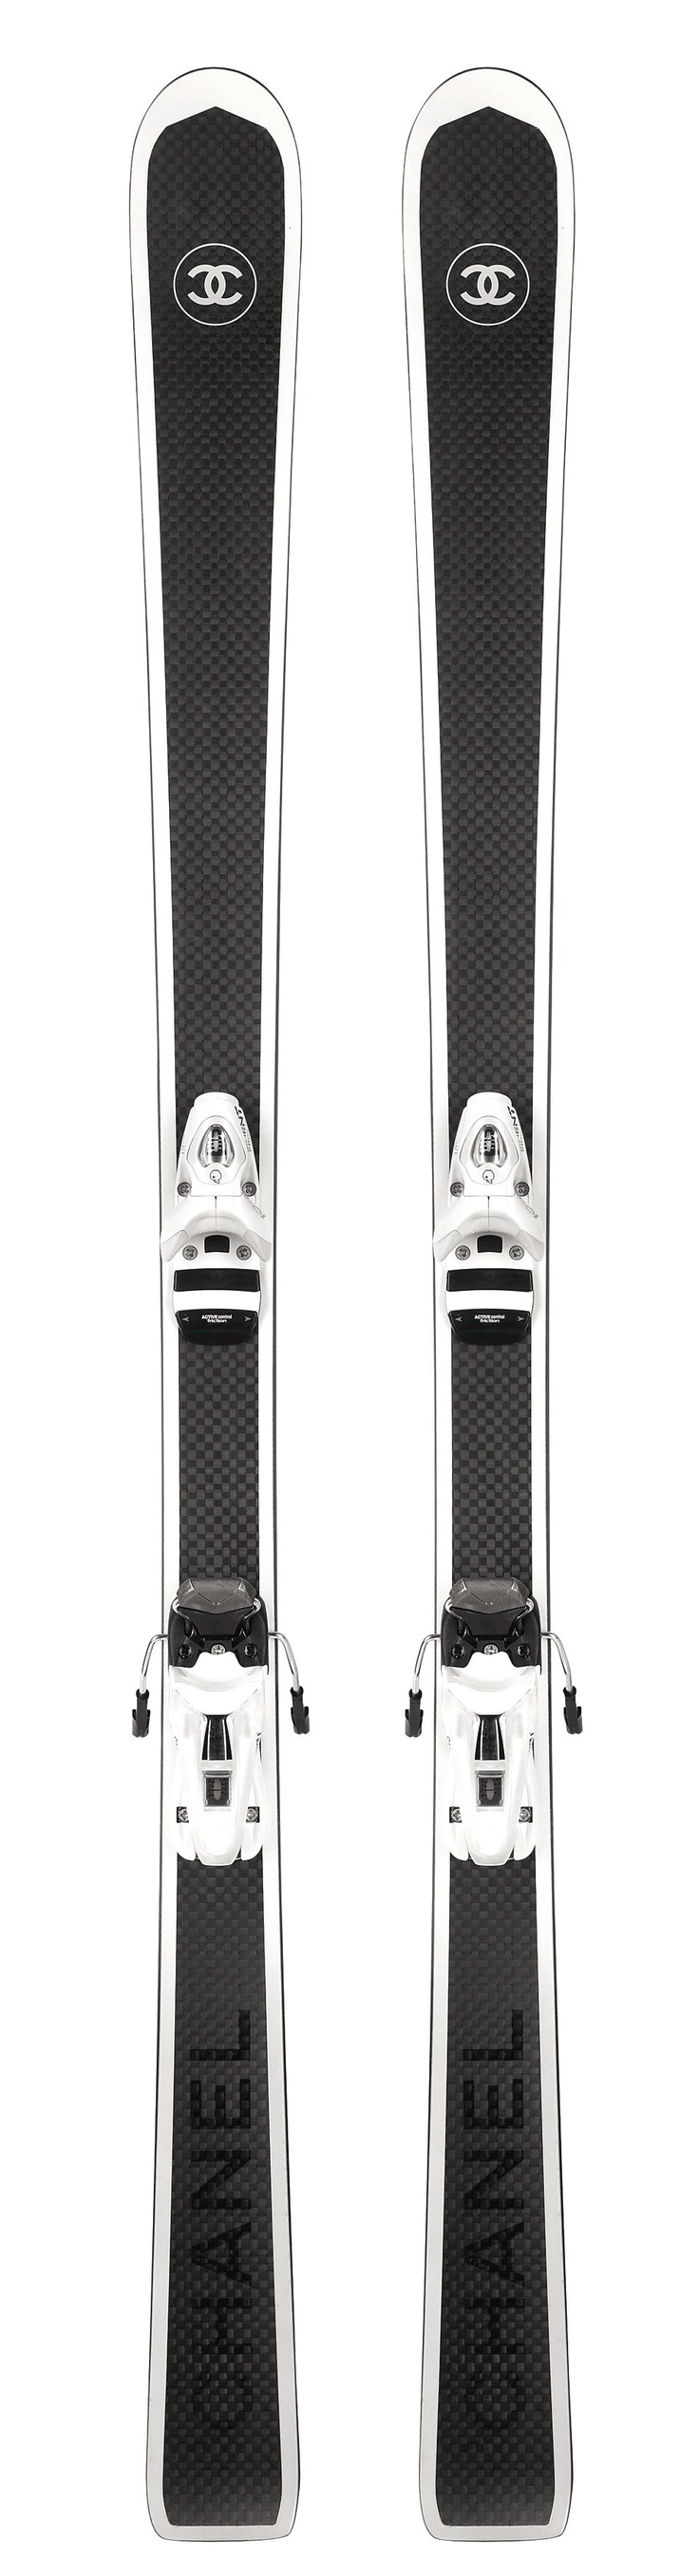 Every Glamazon Billionairess Needs Chanel Ski's To Stay Fabulous On The Slopes -ShazB  $3,600.  www.chanel.com